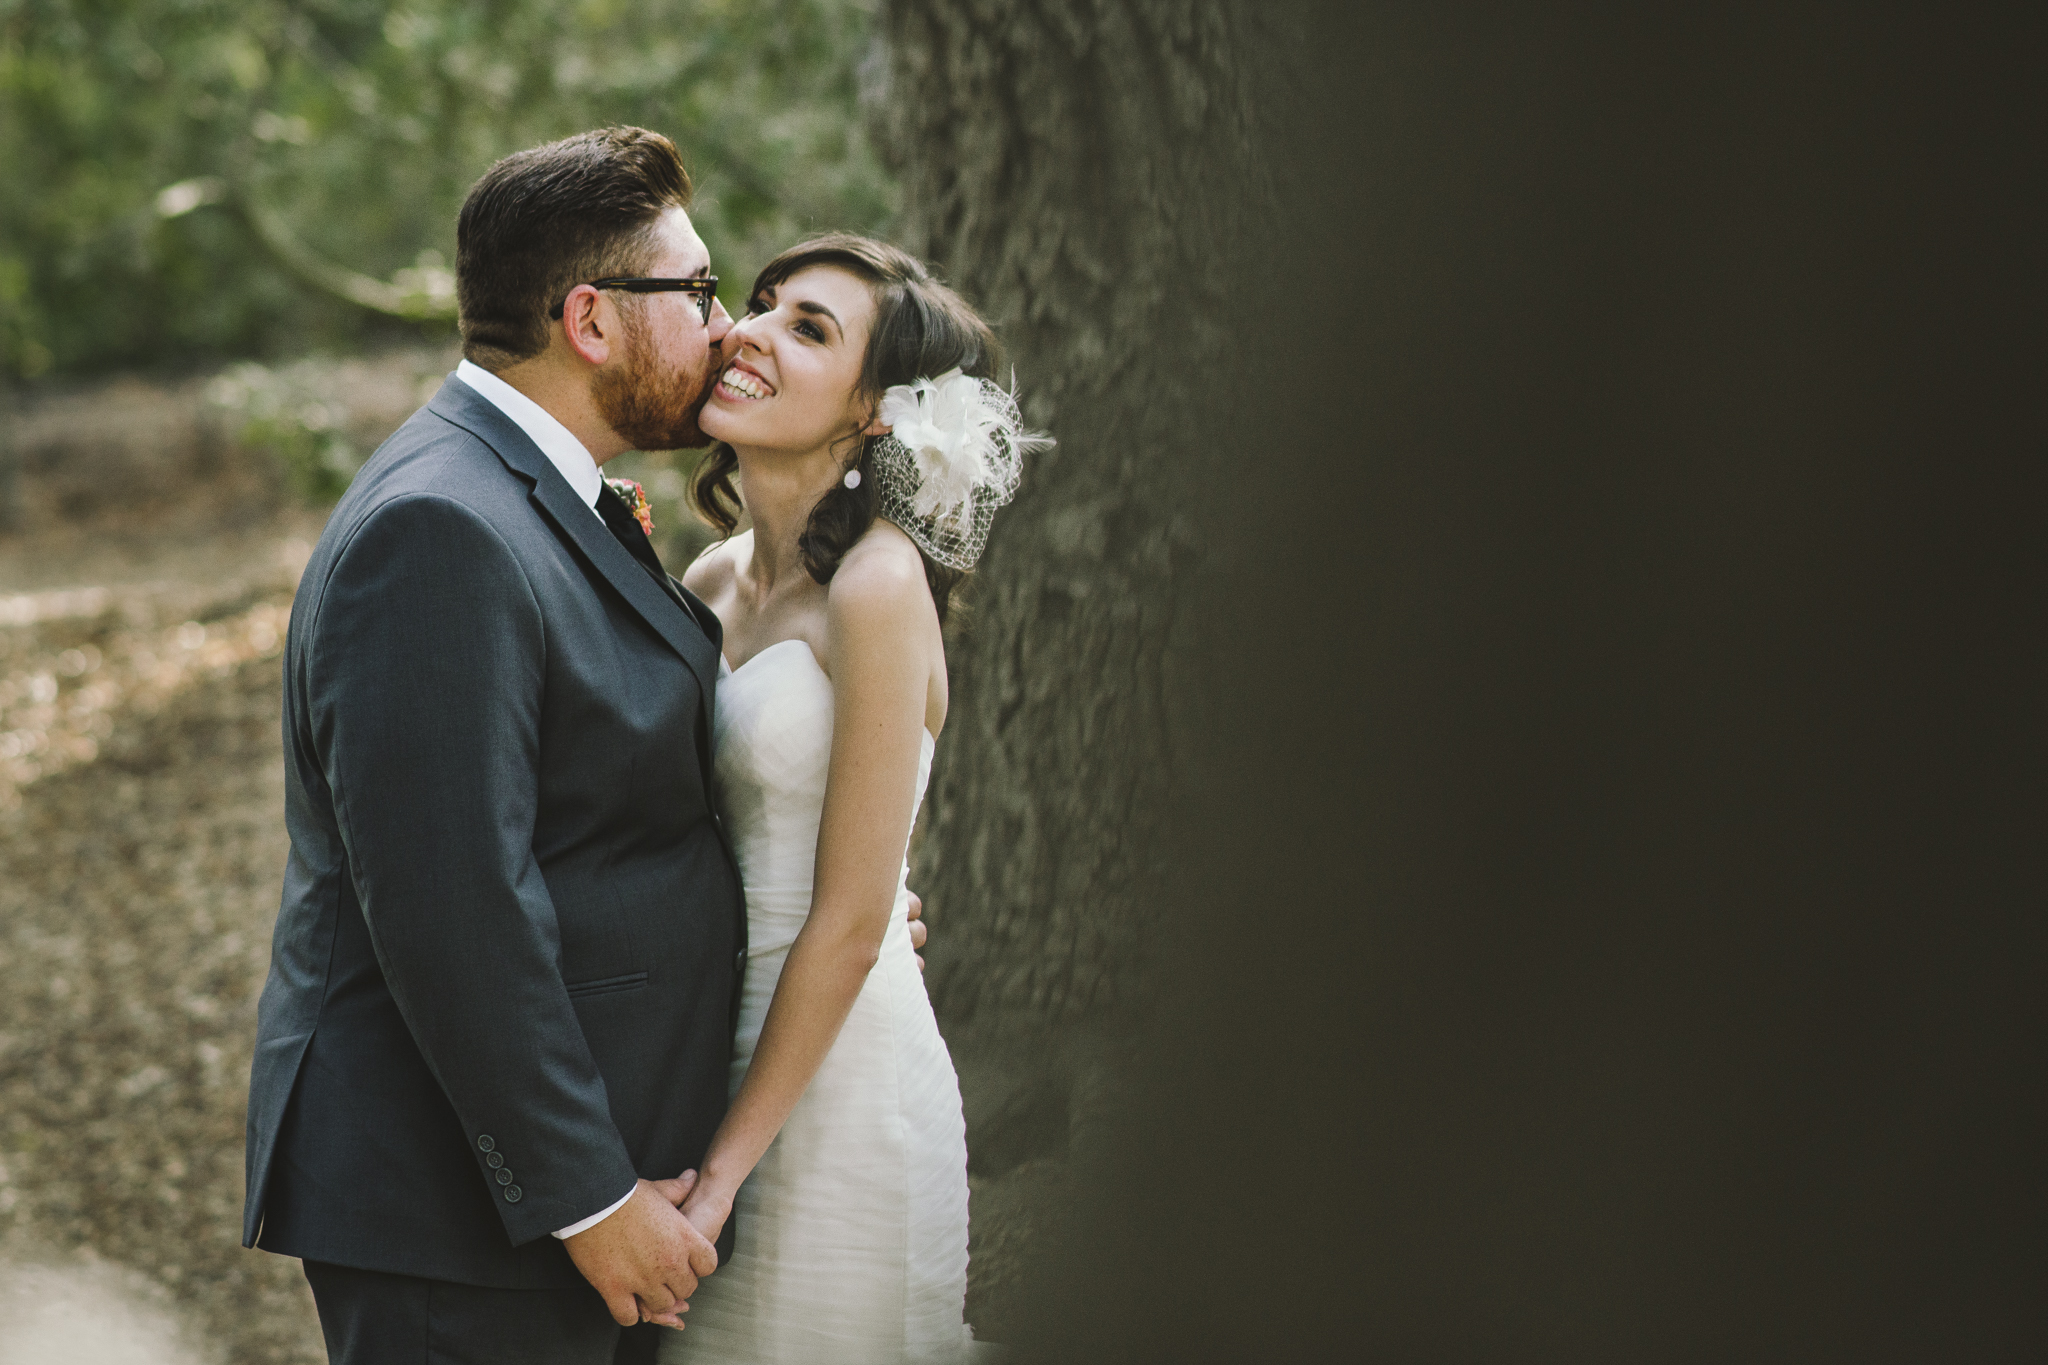 Isaiah & Taylor Photography - Los Angeles Lifestyle Wedding Photographer-24.jpg